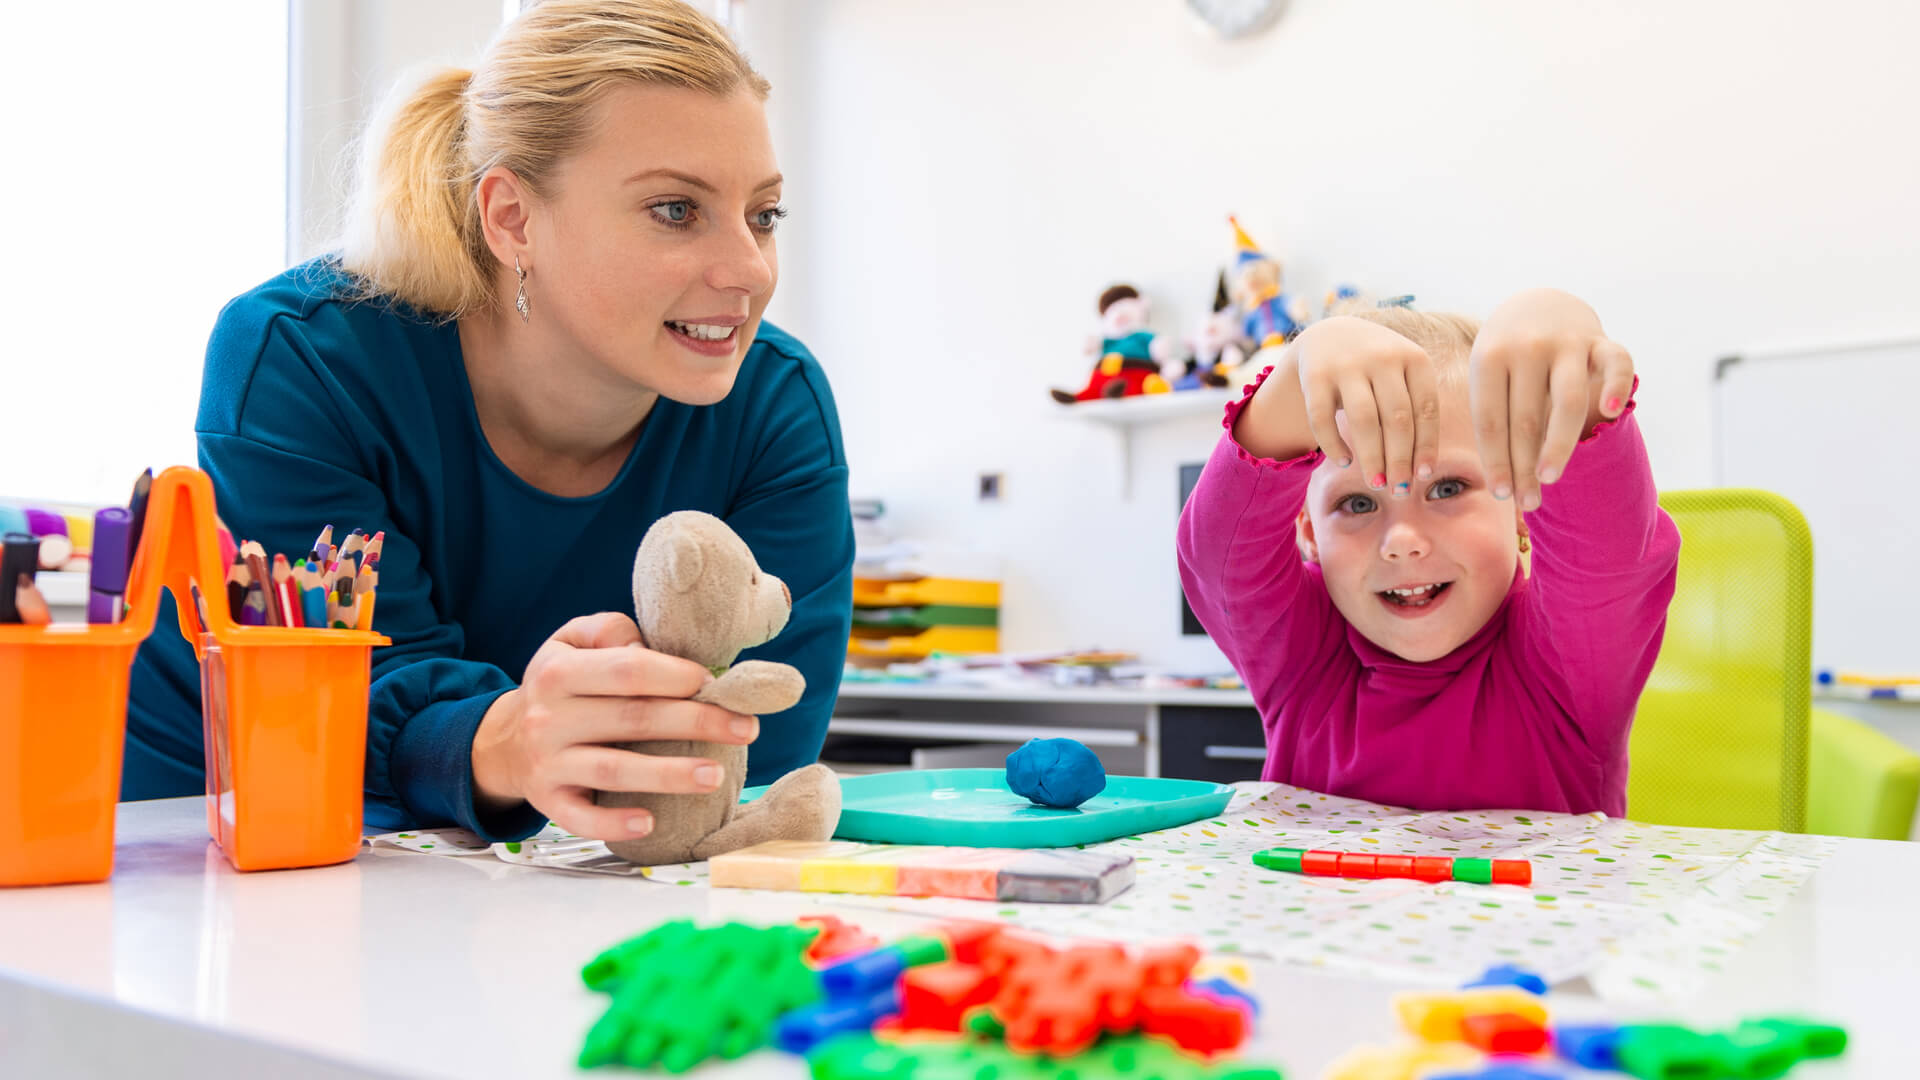 Stimming behaviour in kids on autism spectrum